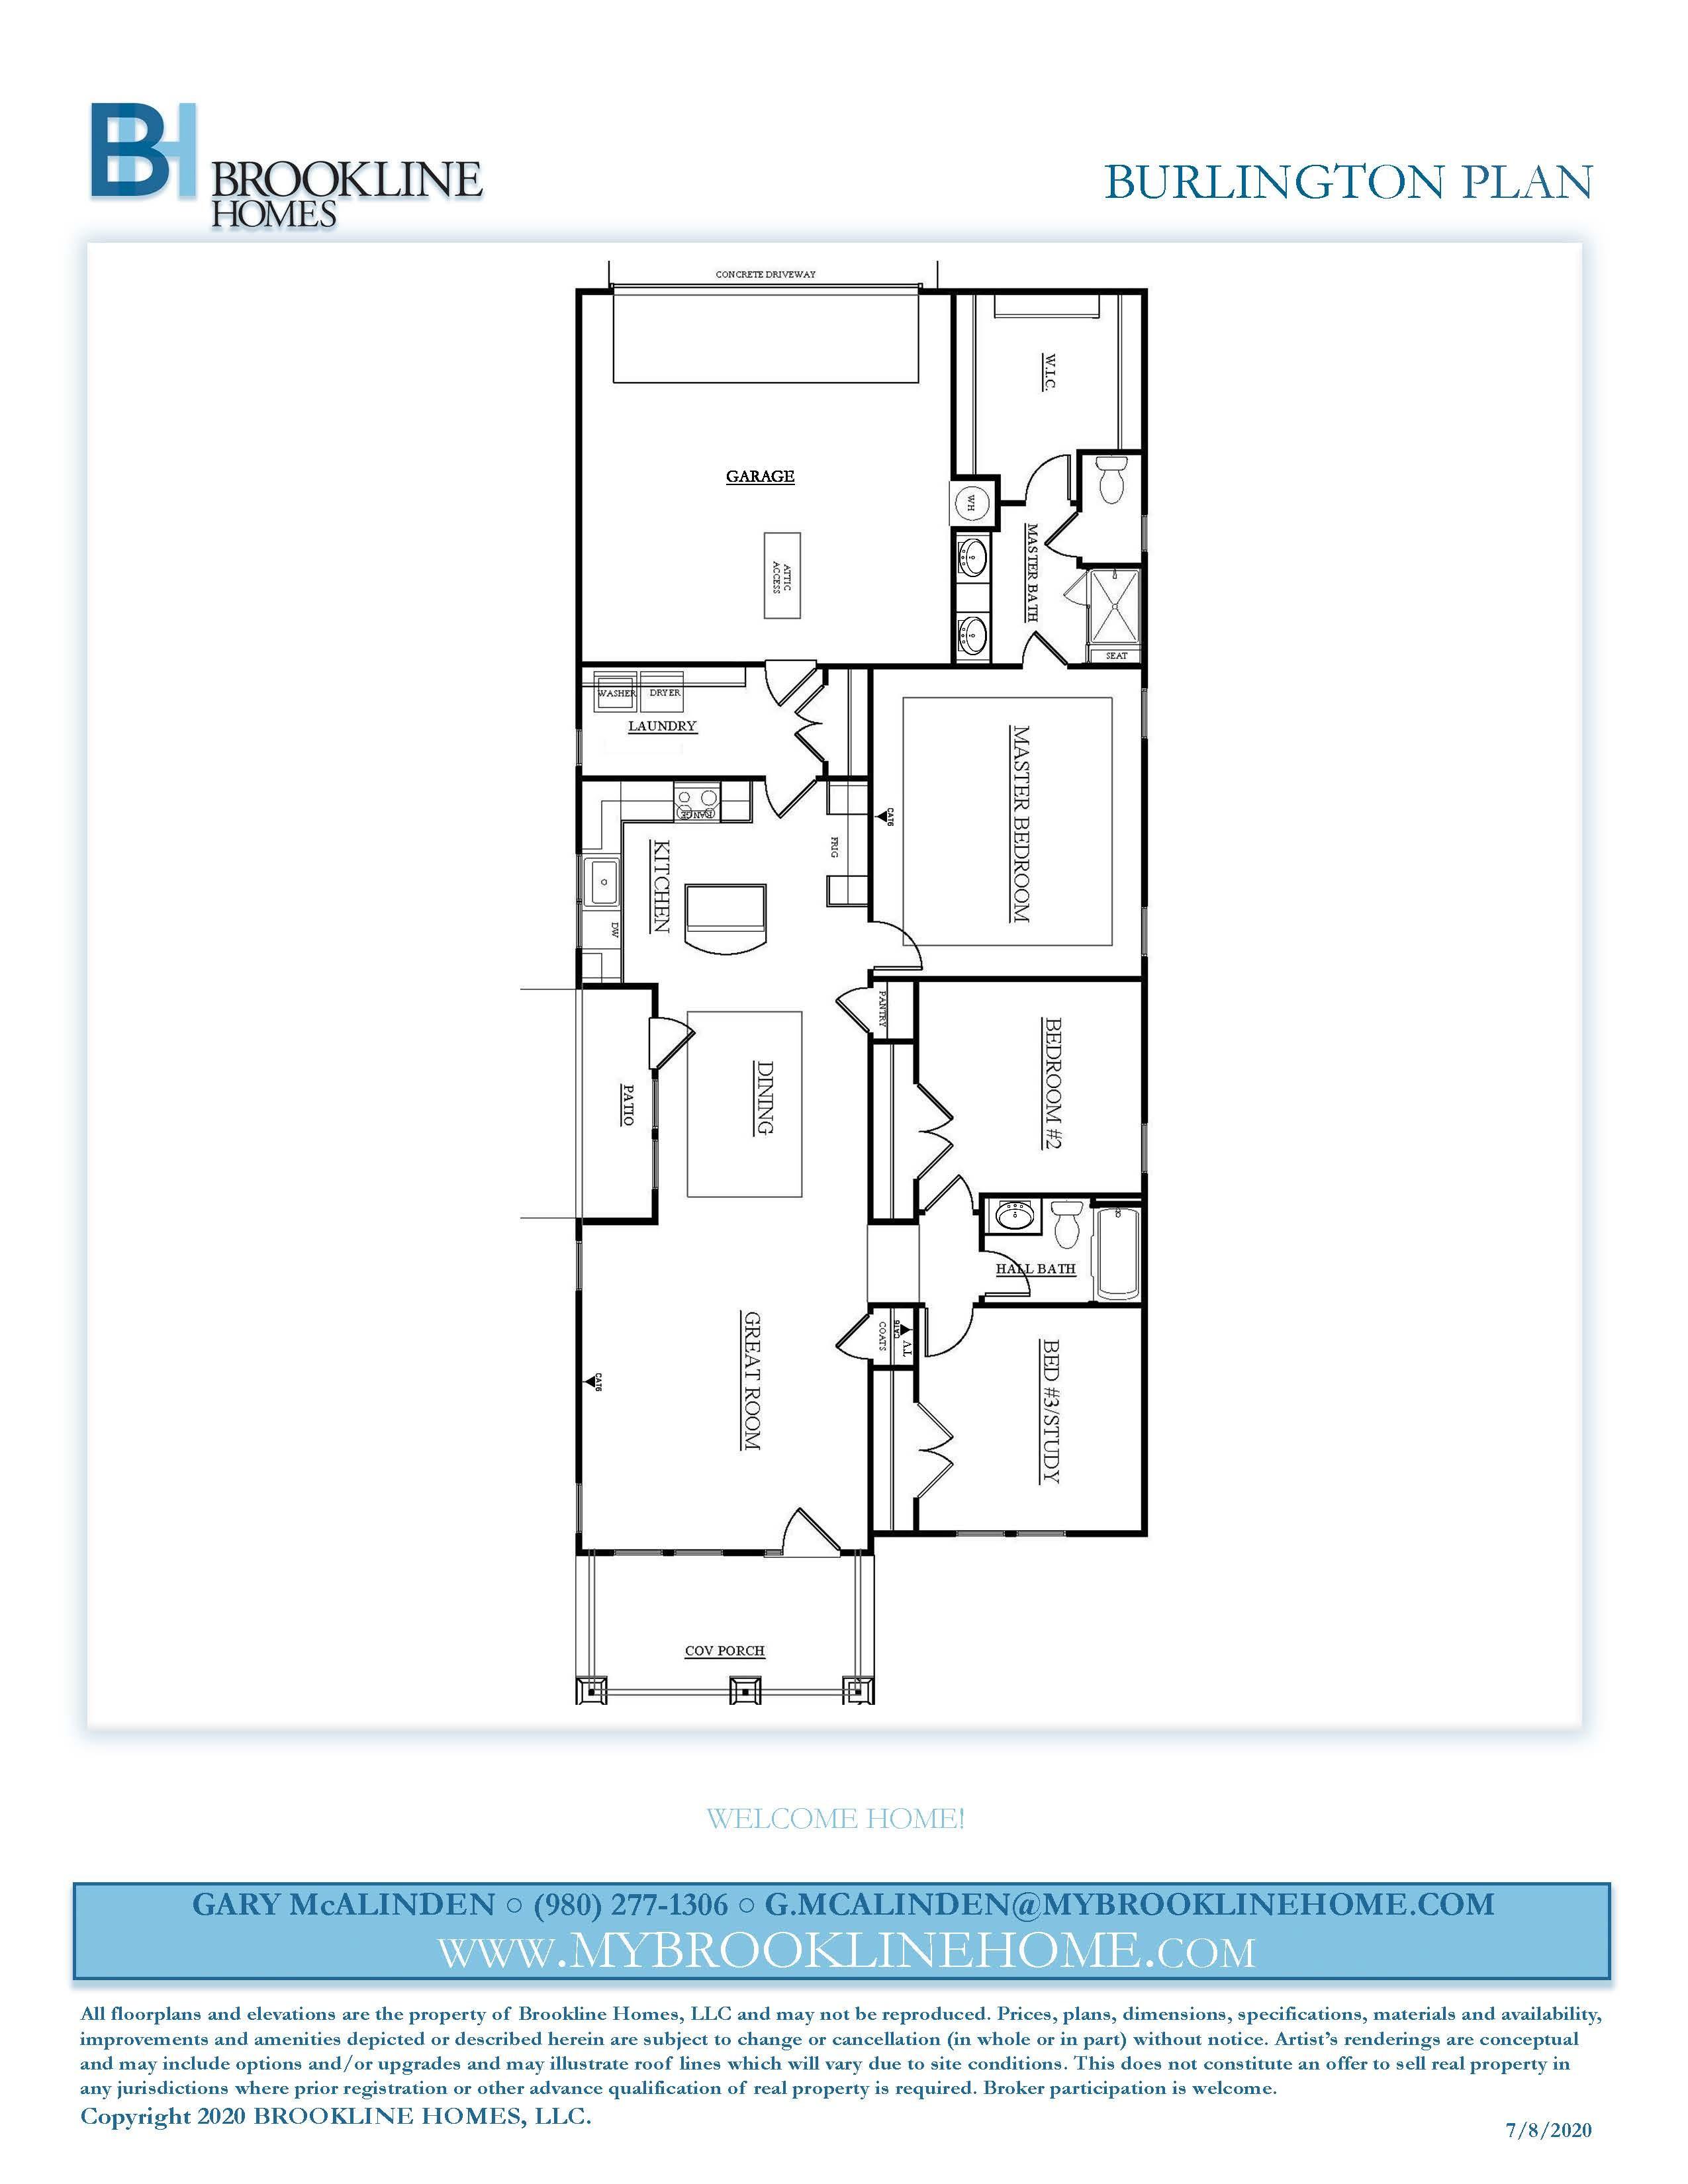 BURLINGTON Floorplan 7.8.20.jpg